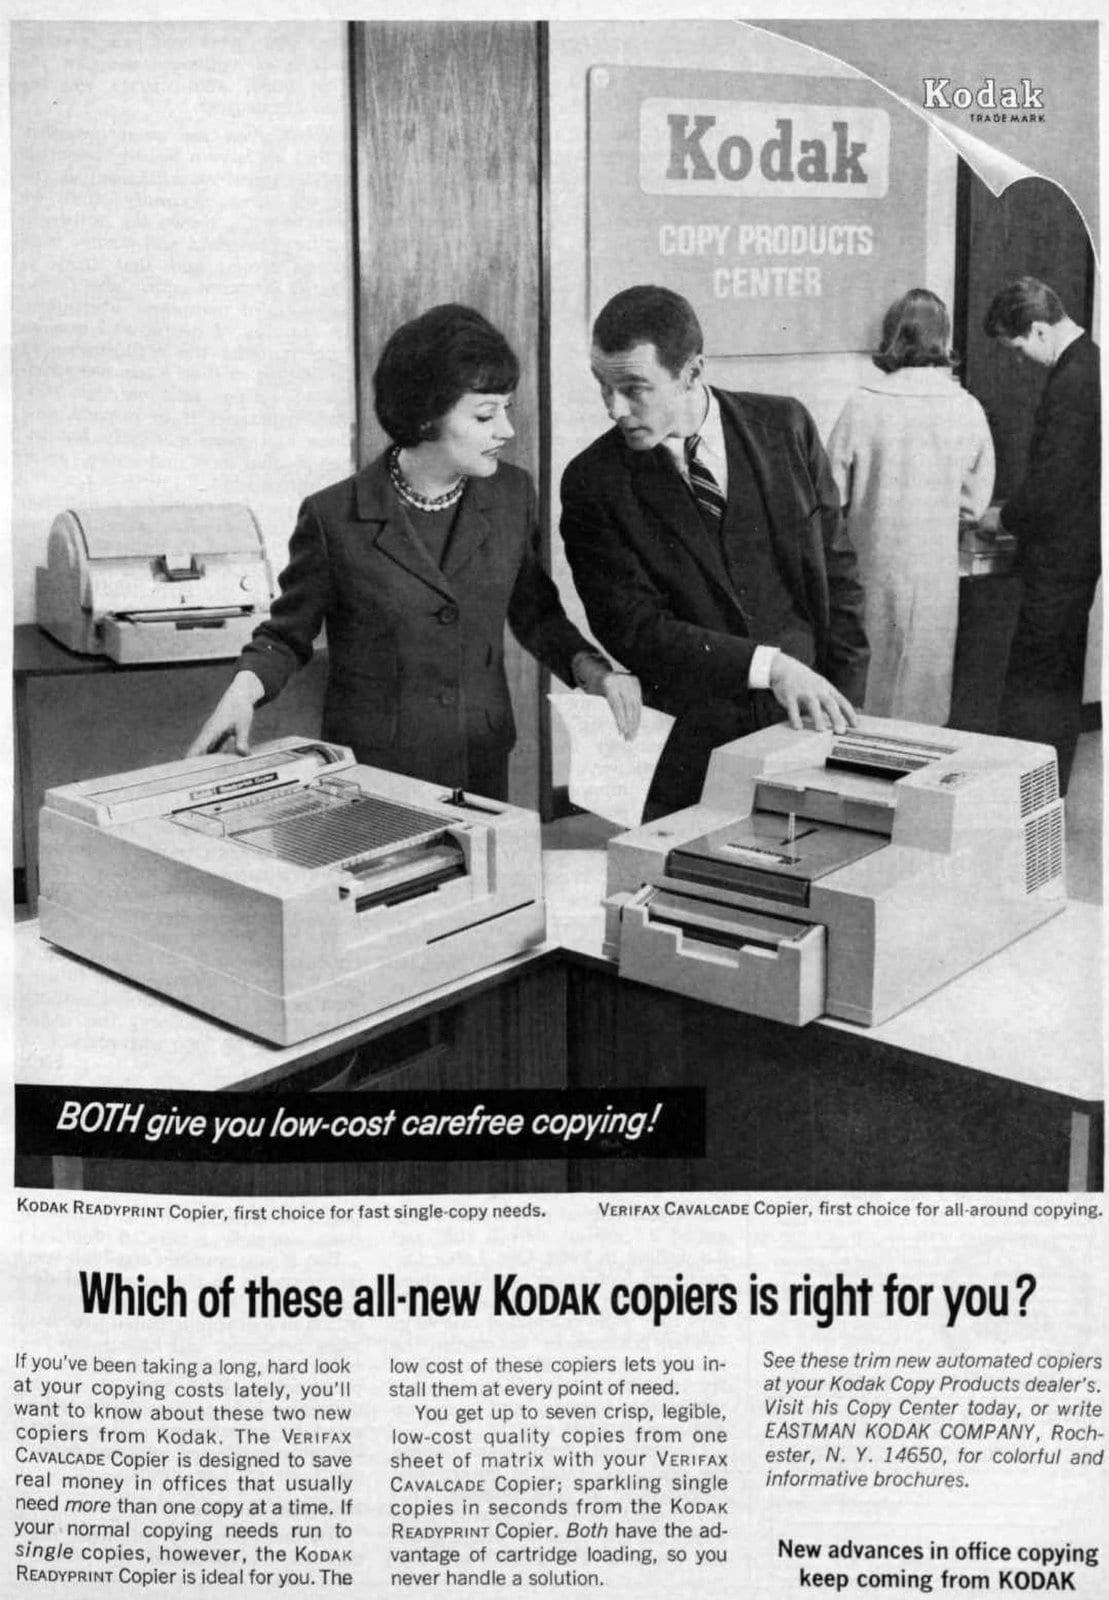 Vintage Kodak copiers (1964)